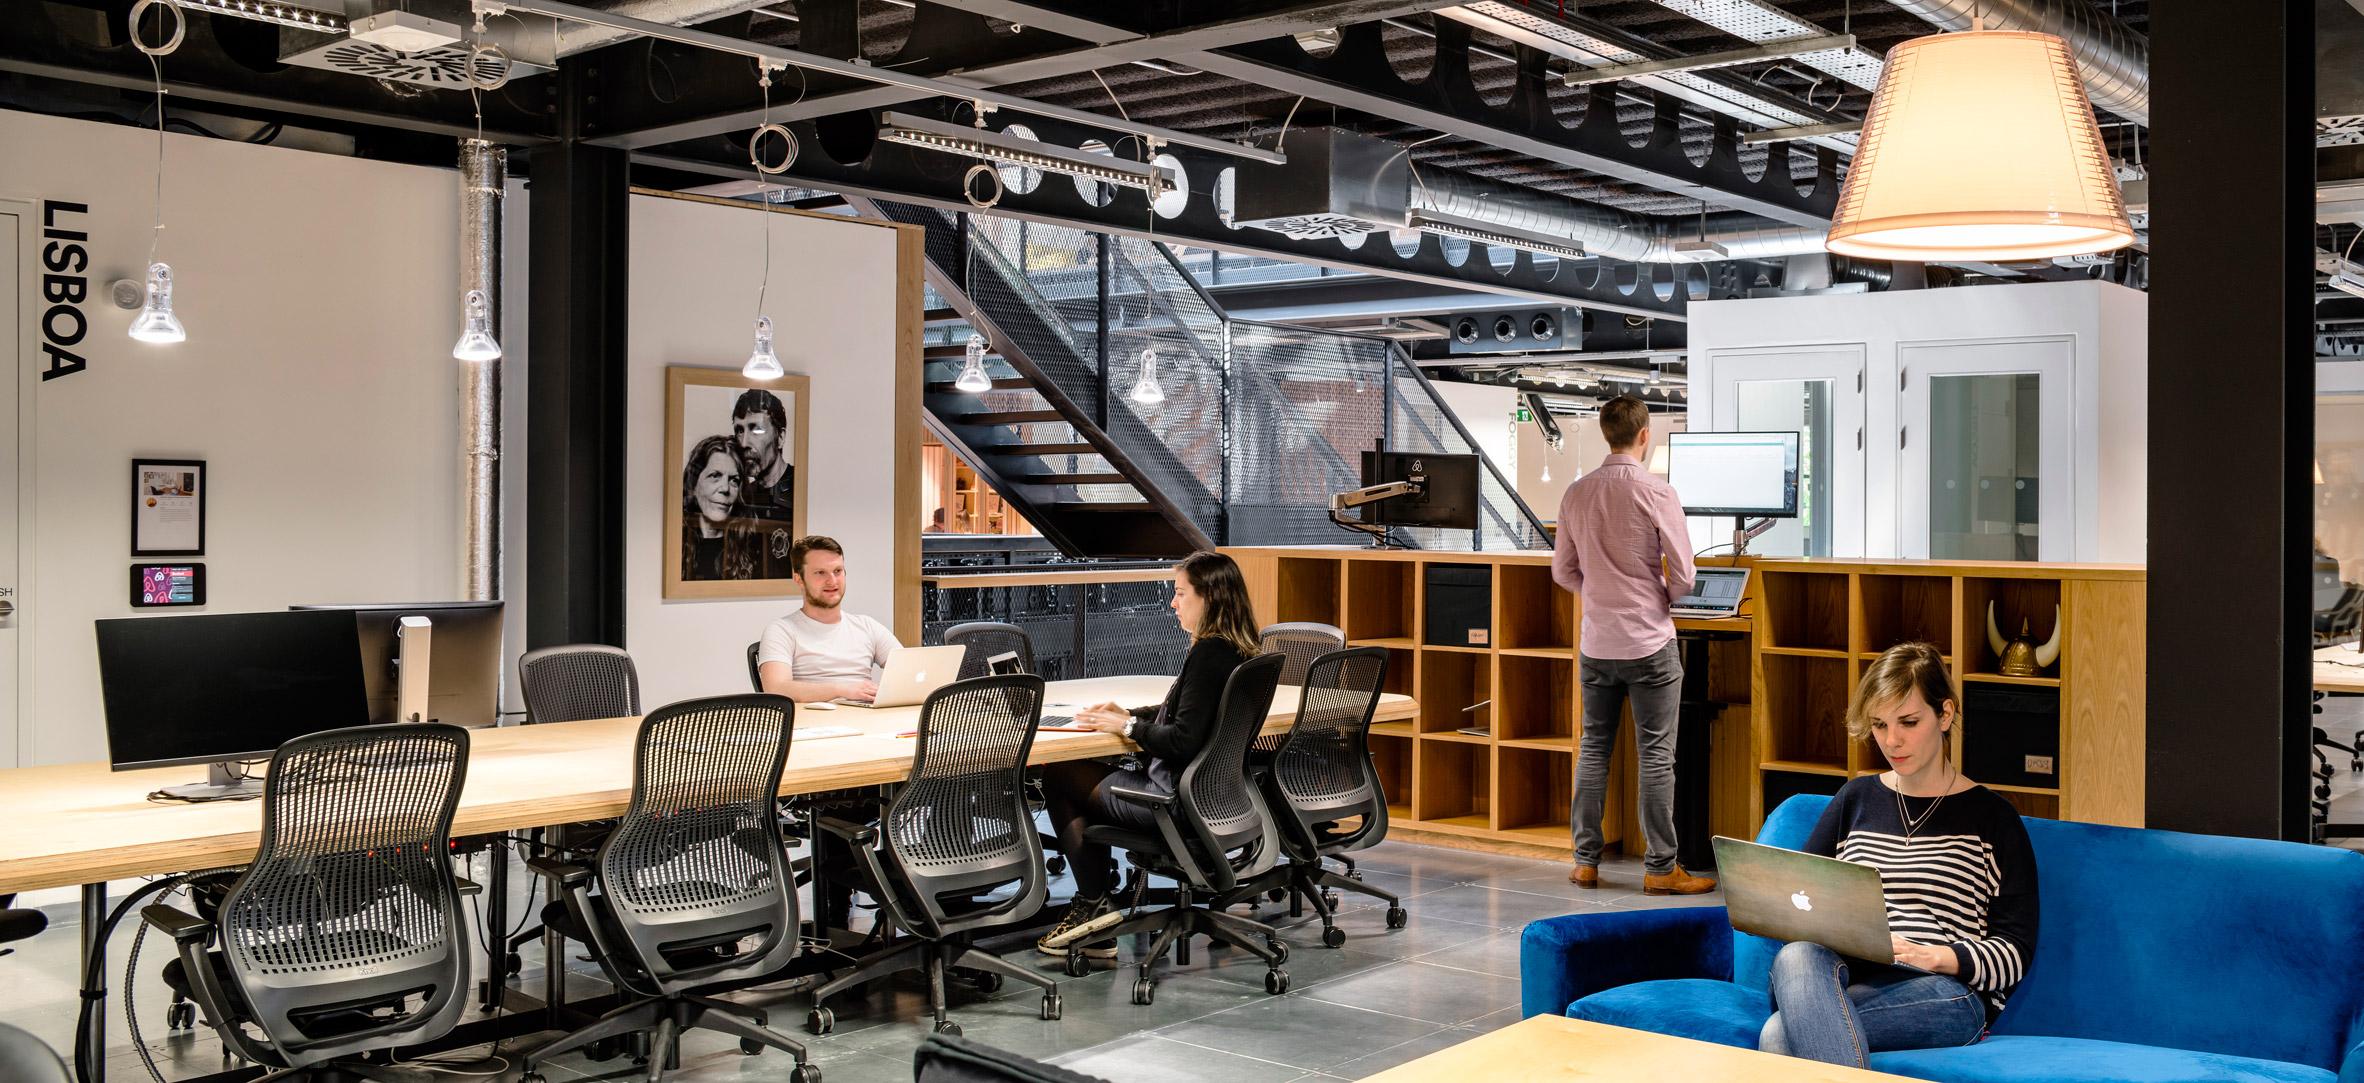 airbnb-dublin-office-interiors-ireland-offices_dezeen_2364_col_3